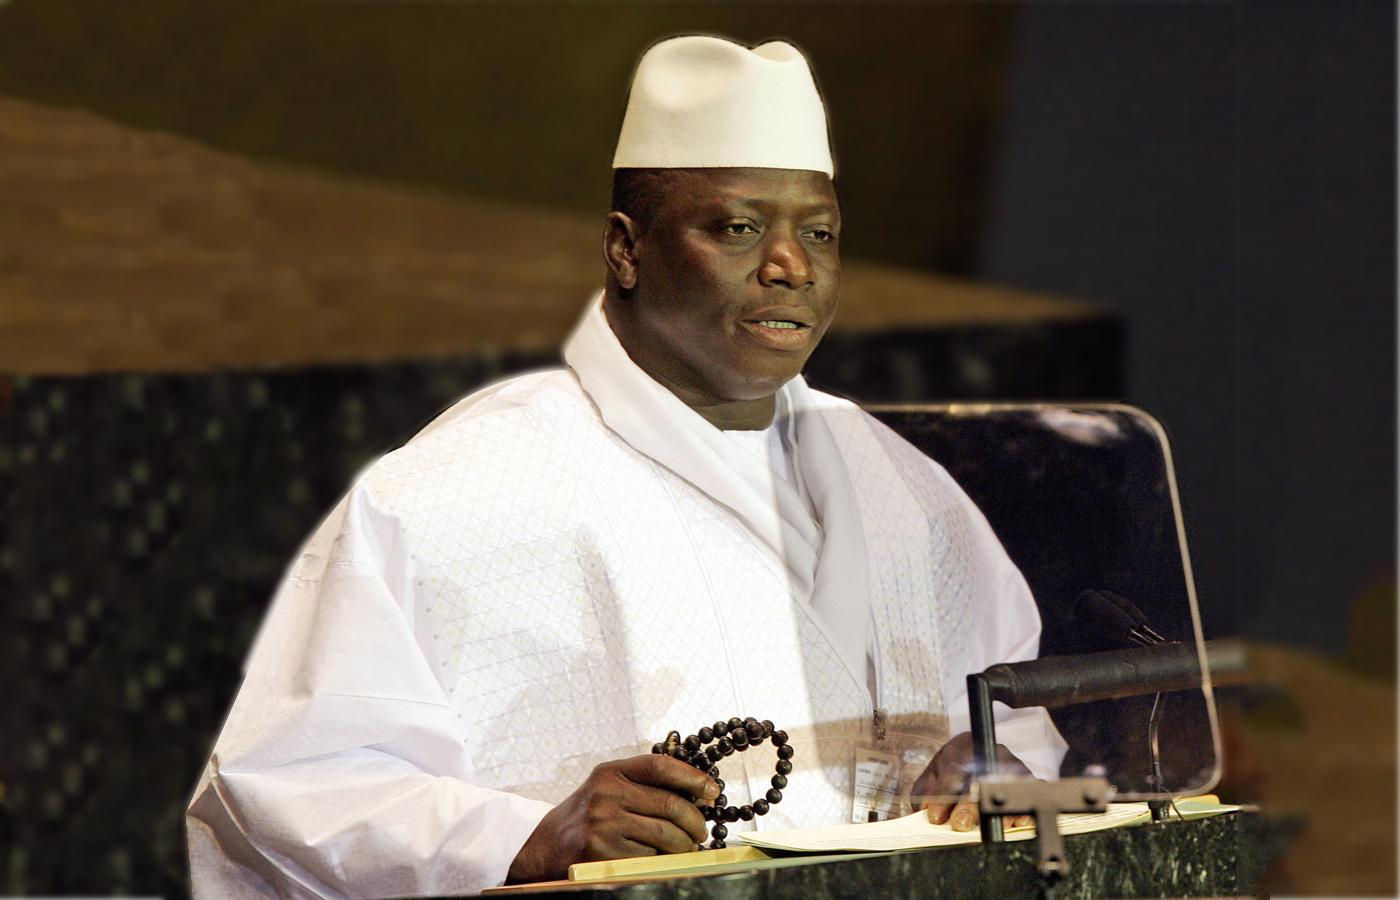 Gambie : Le Ghana examine l'extradition de Yahya Jammeh